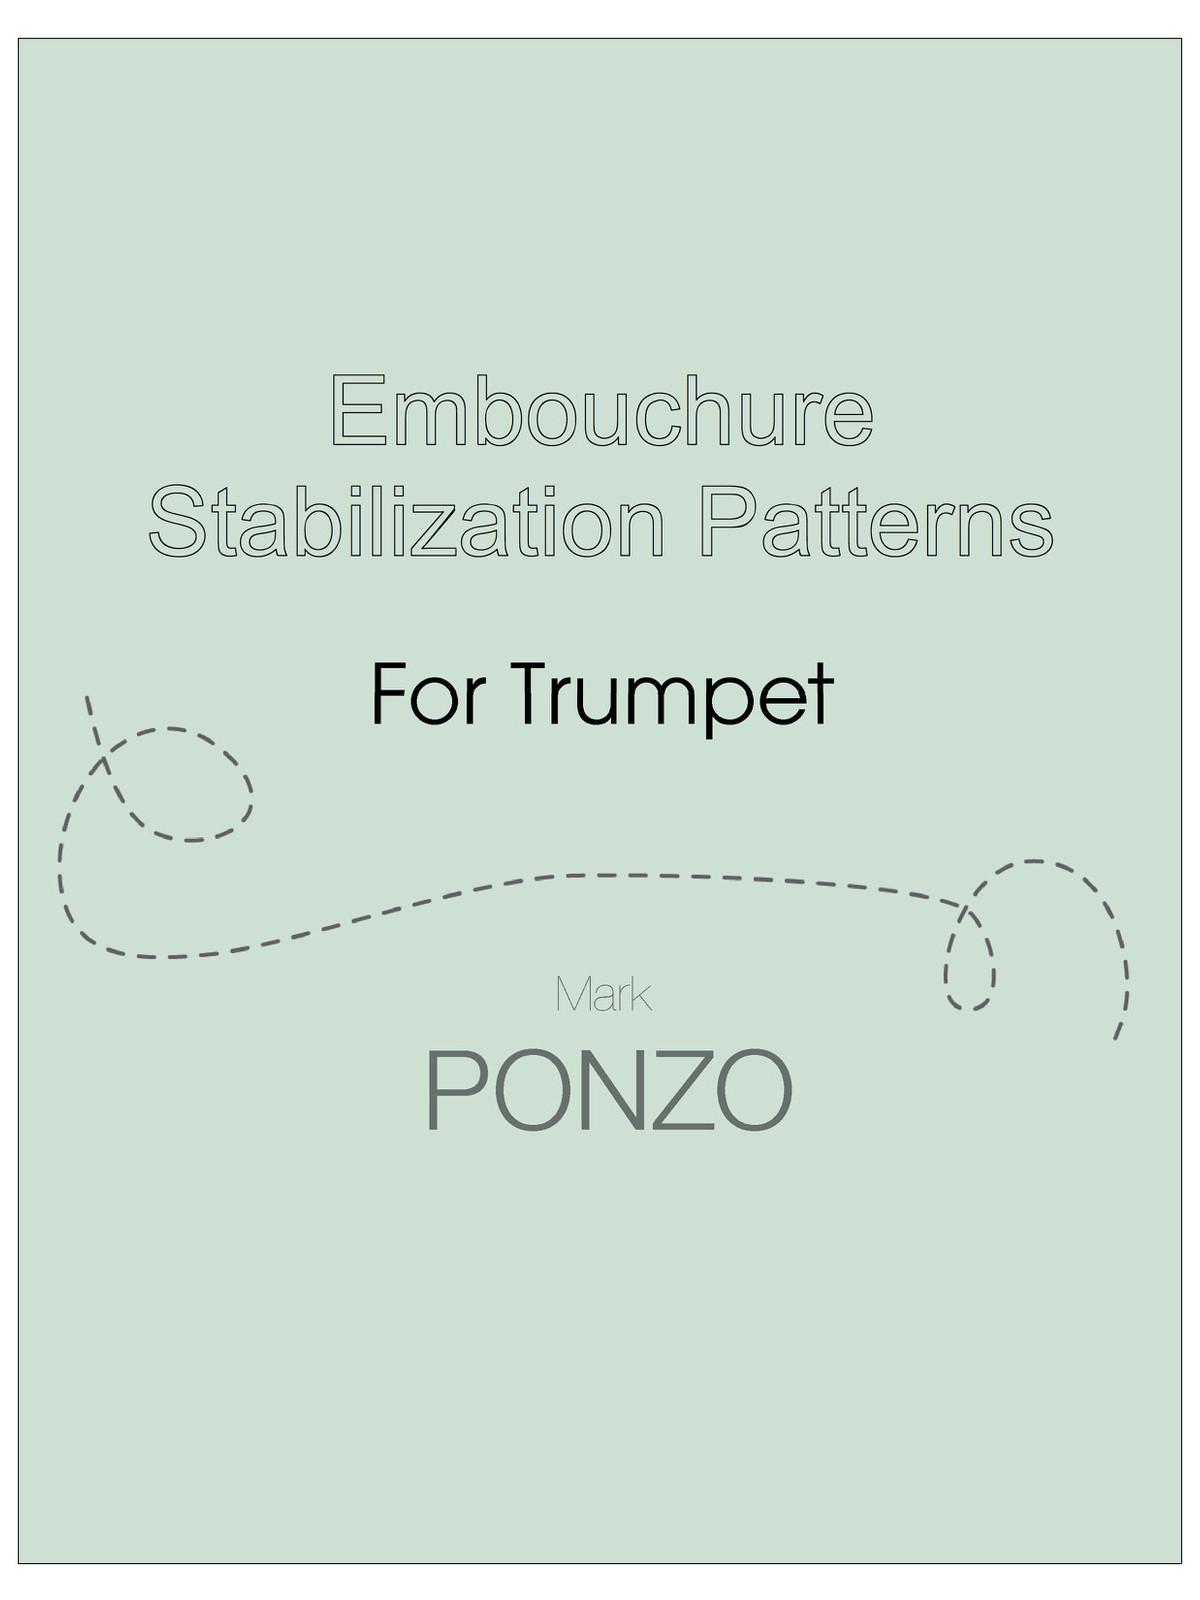 Ponzo, Embouchure Stabilization Patterns for Trumpet